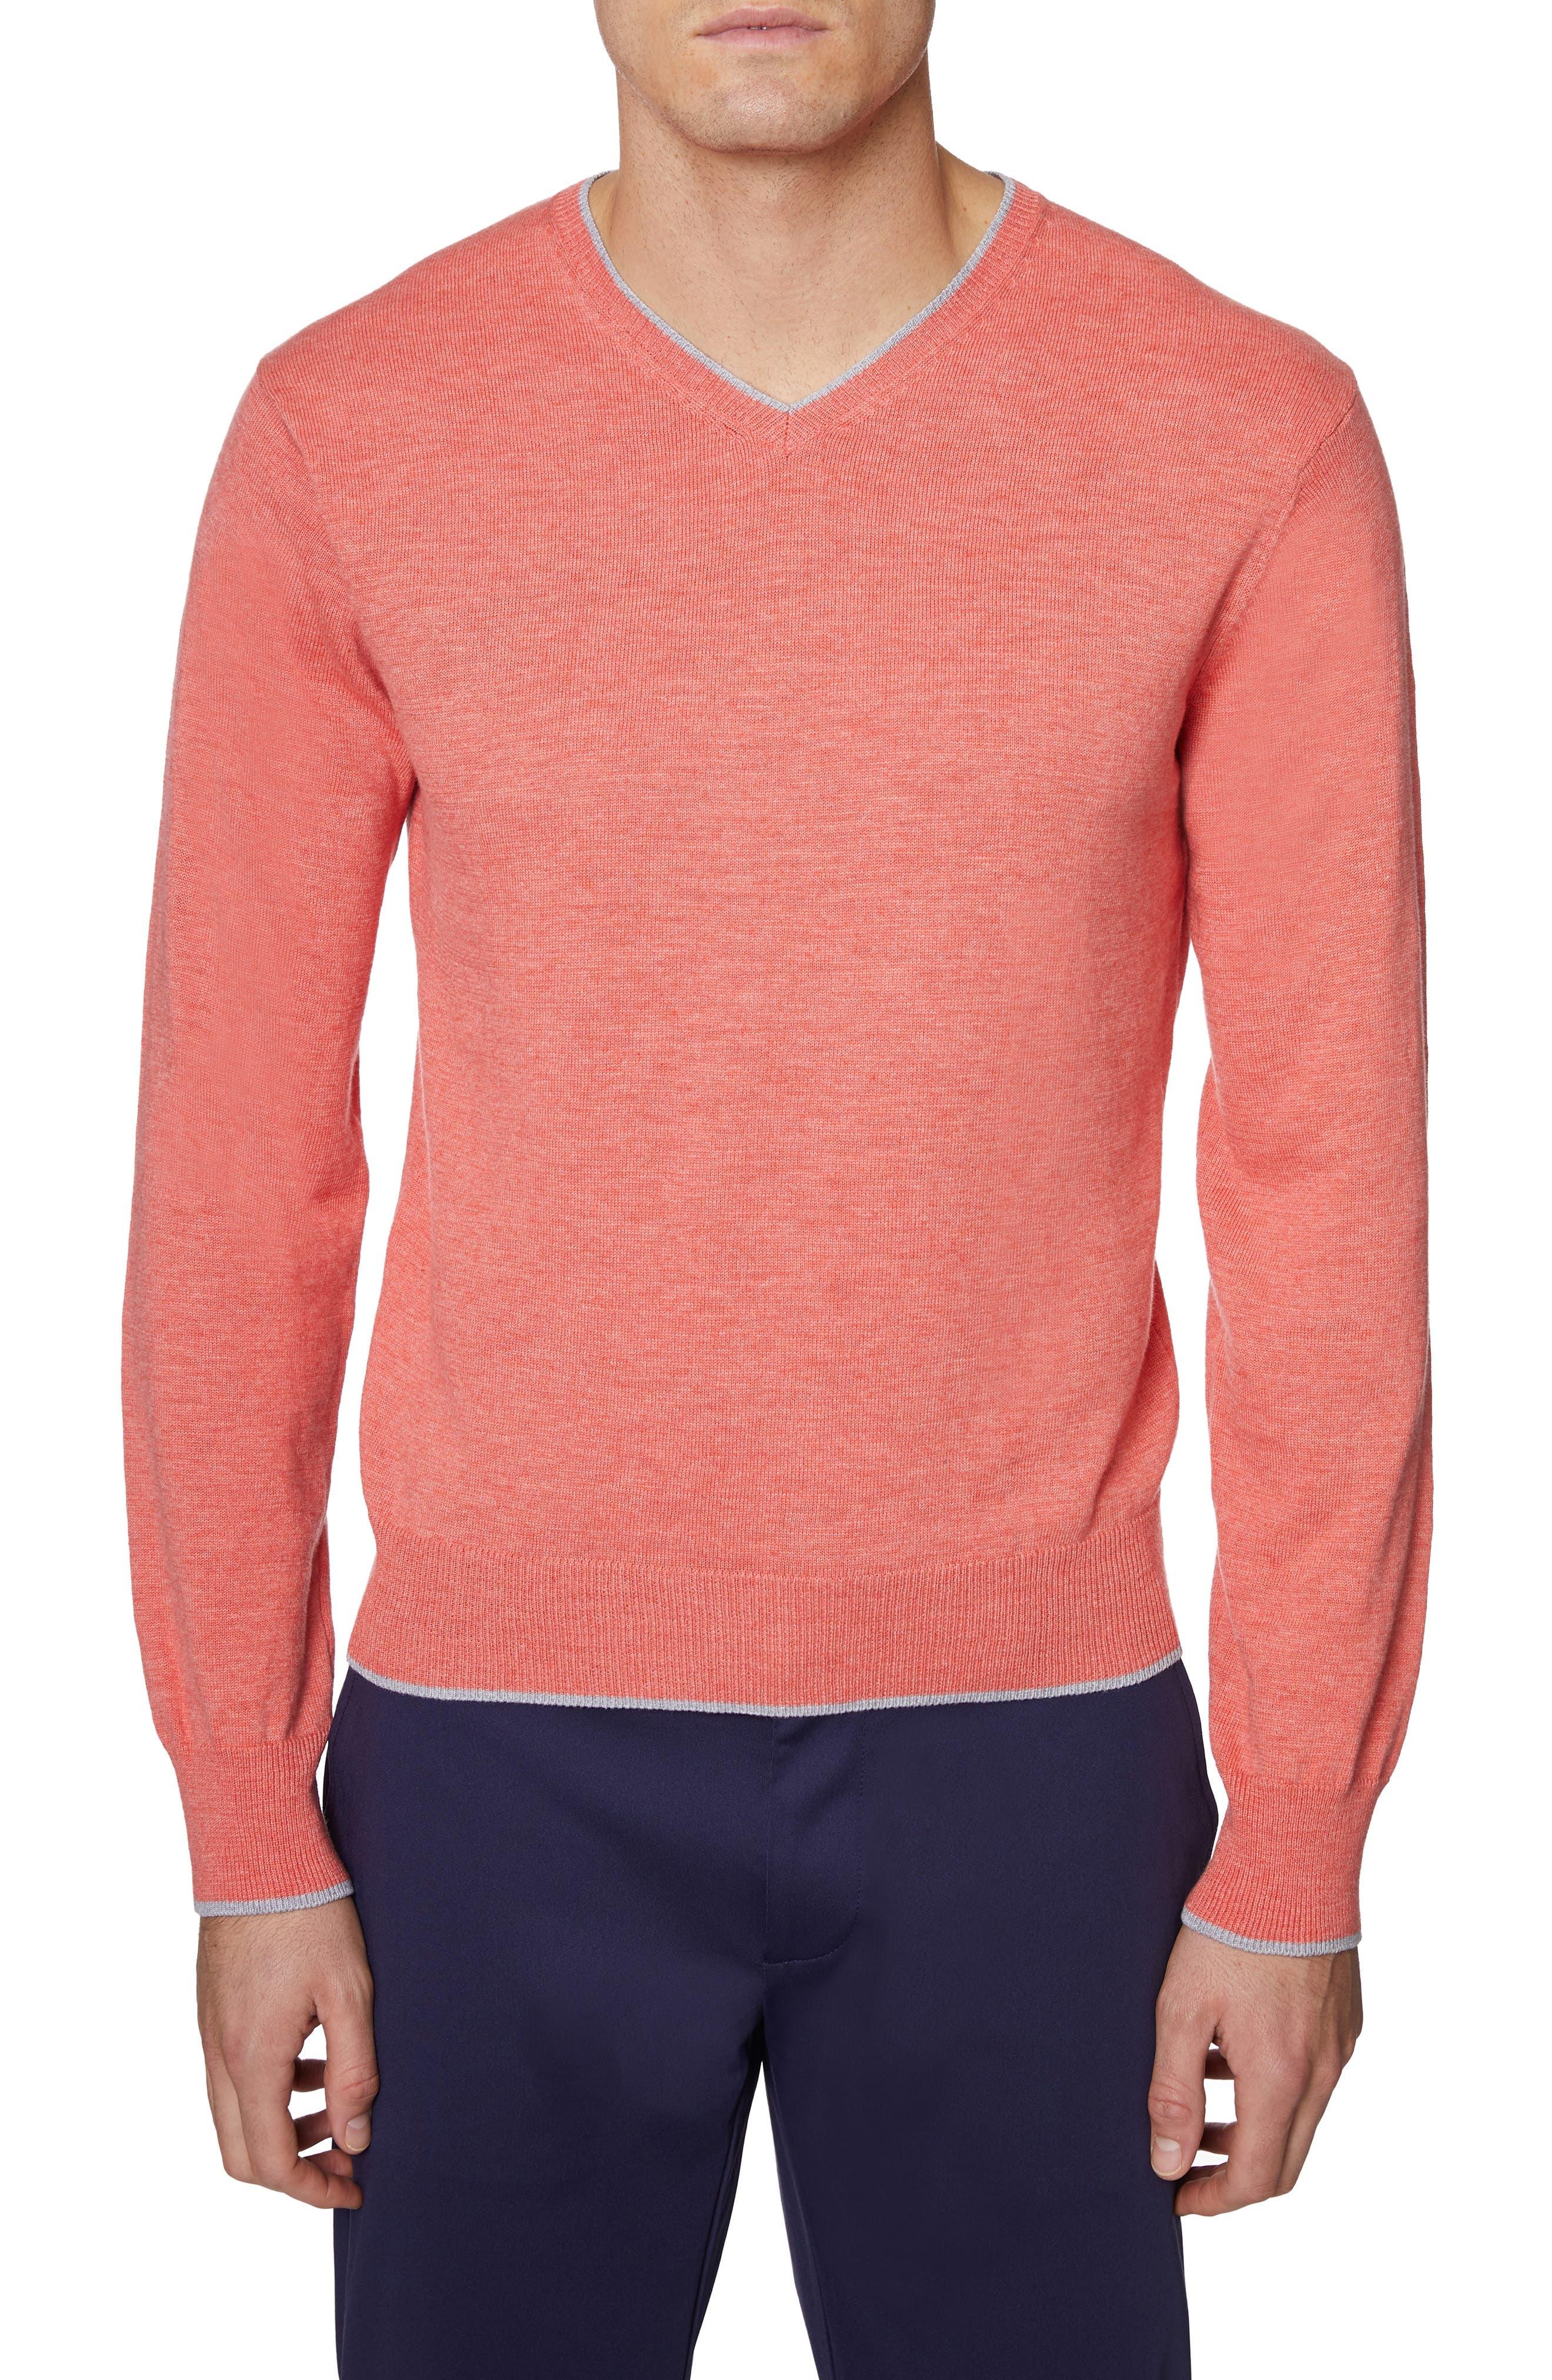 Hickey Freeman V-Neck Cotton Sweater